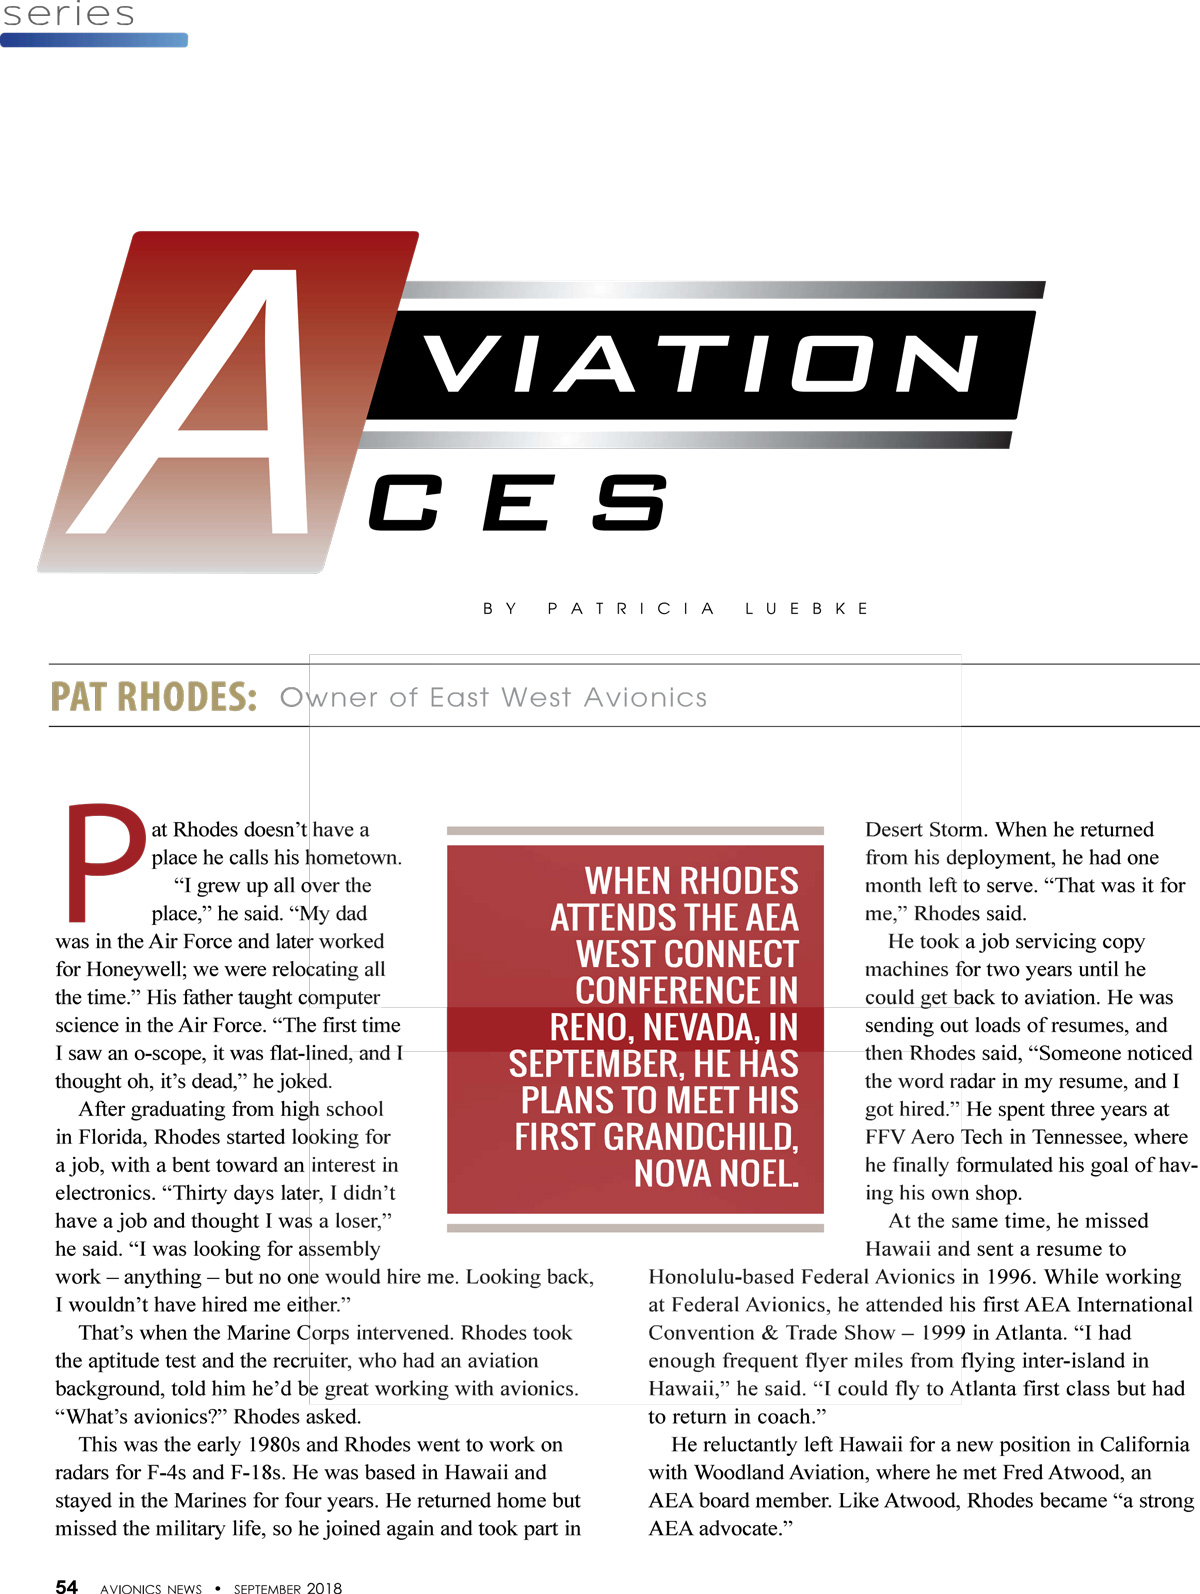 AEA_AvionicsNews_PatRhodes_Article2-1.jpg